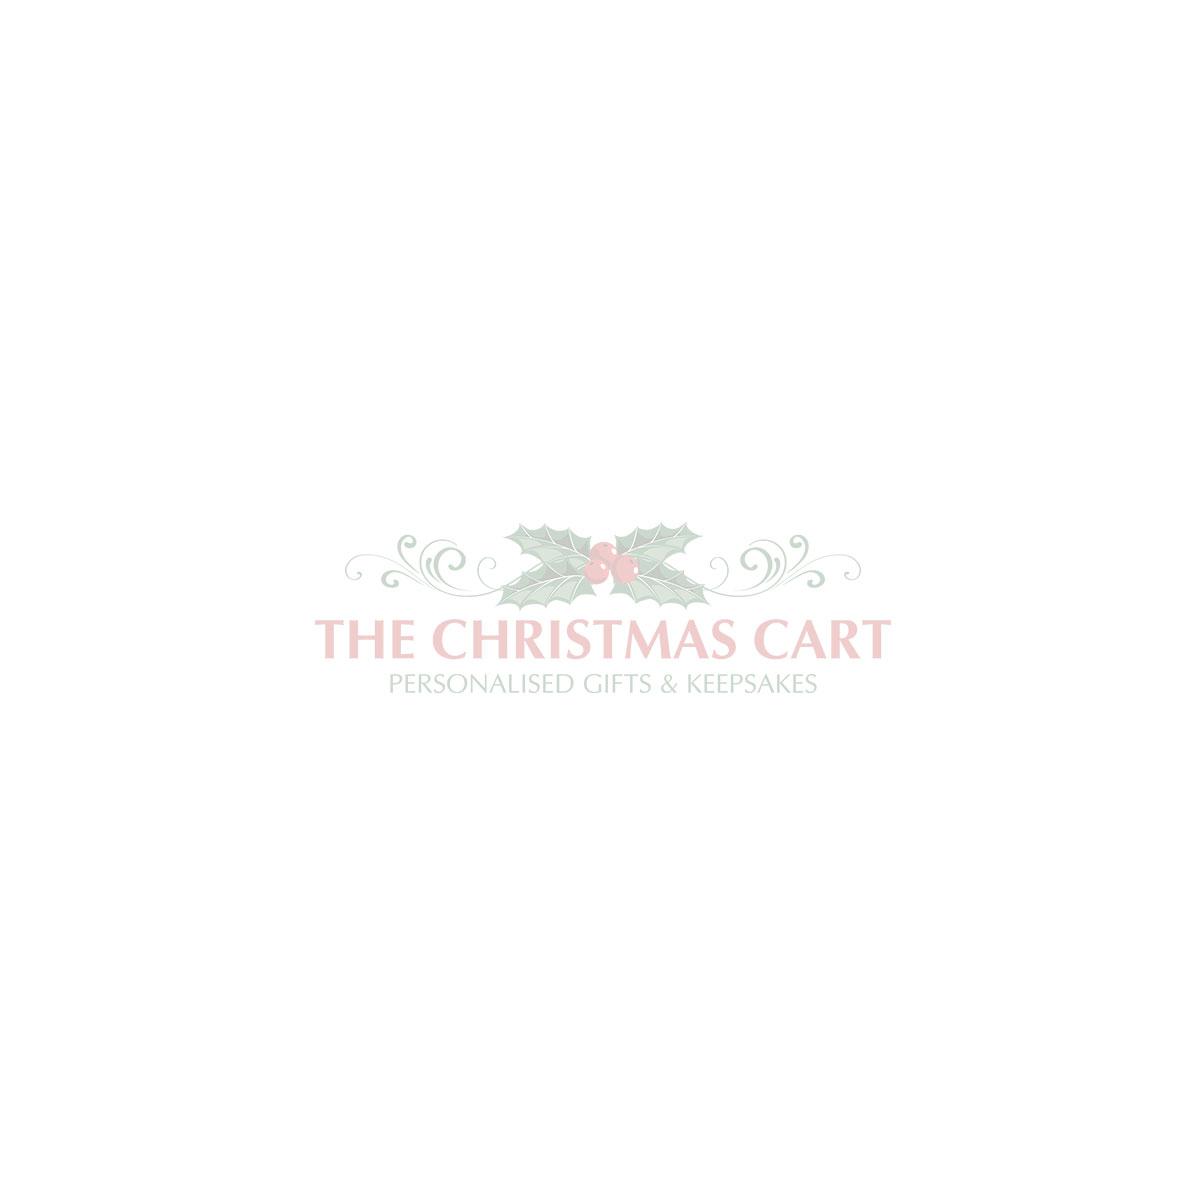 Joy Hope Peace Believe Christmas Poster Print